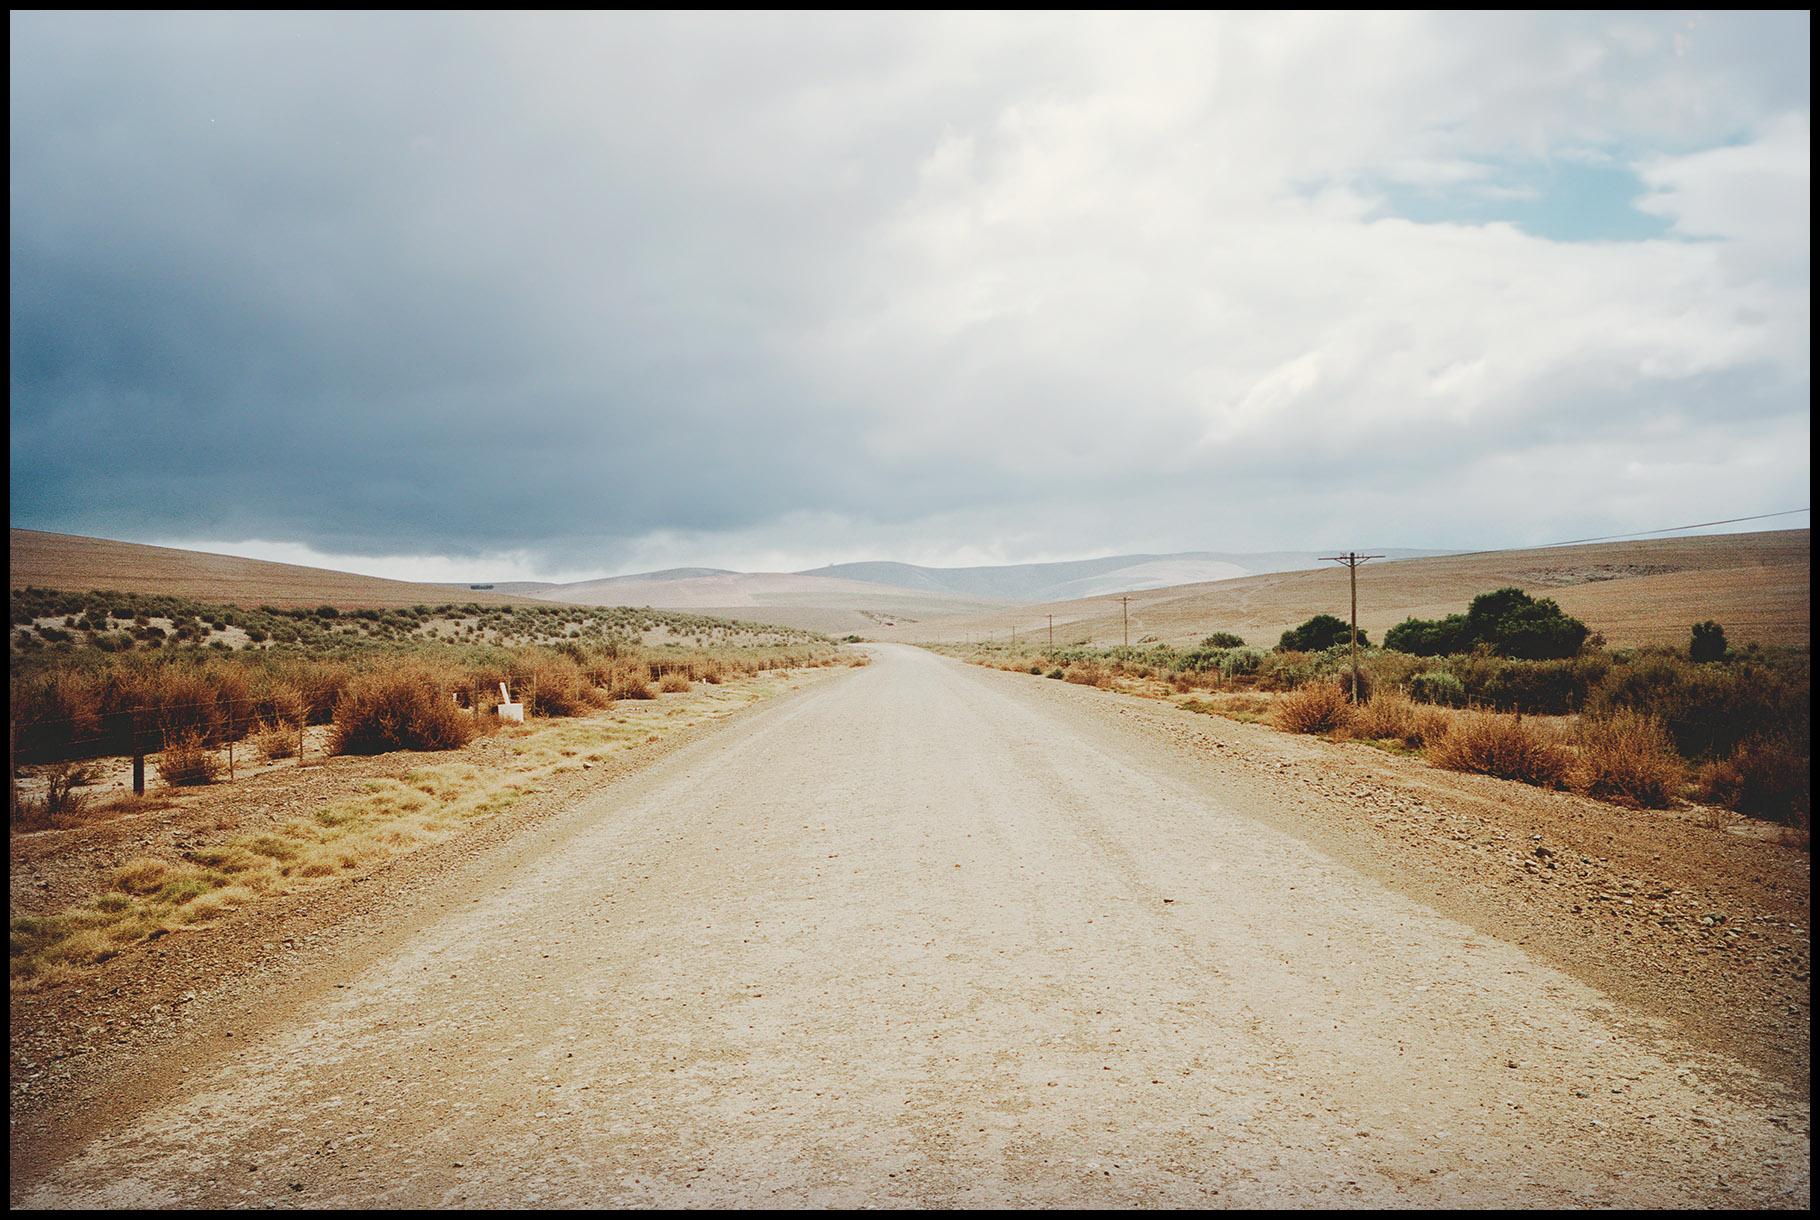 352_28-Florian-Lierzer-Landscape-South-Africa